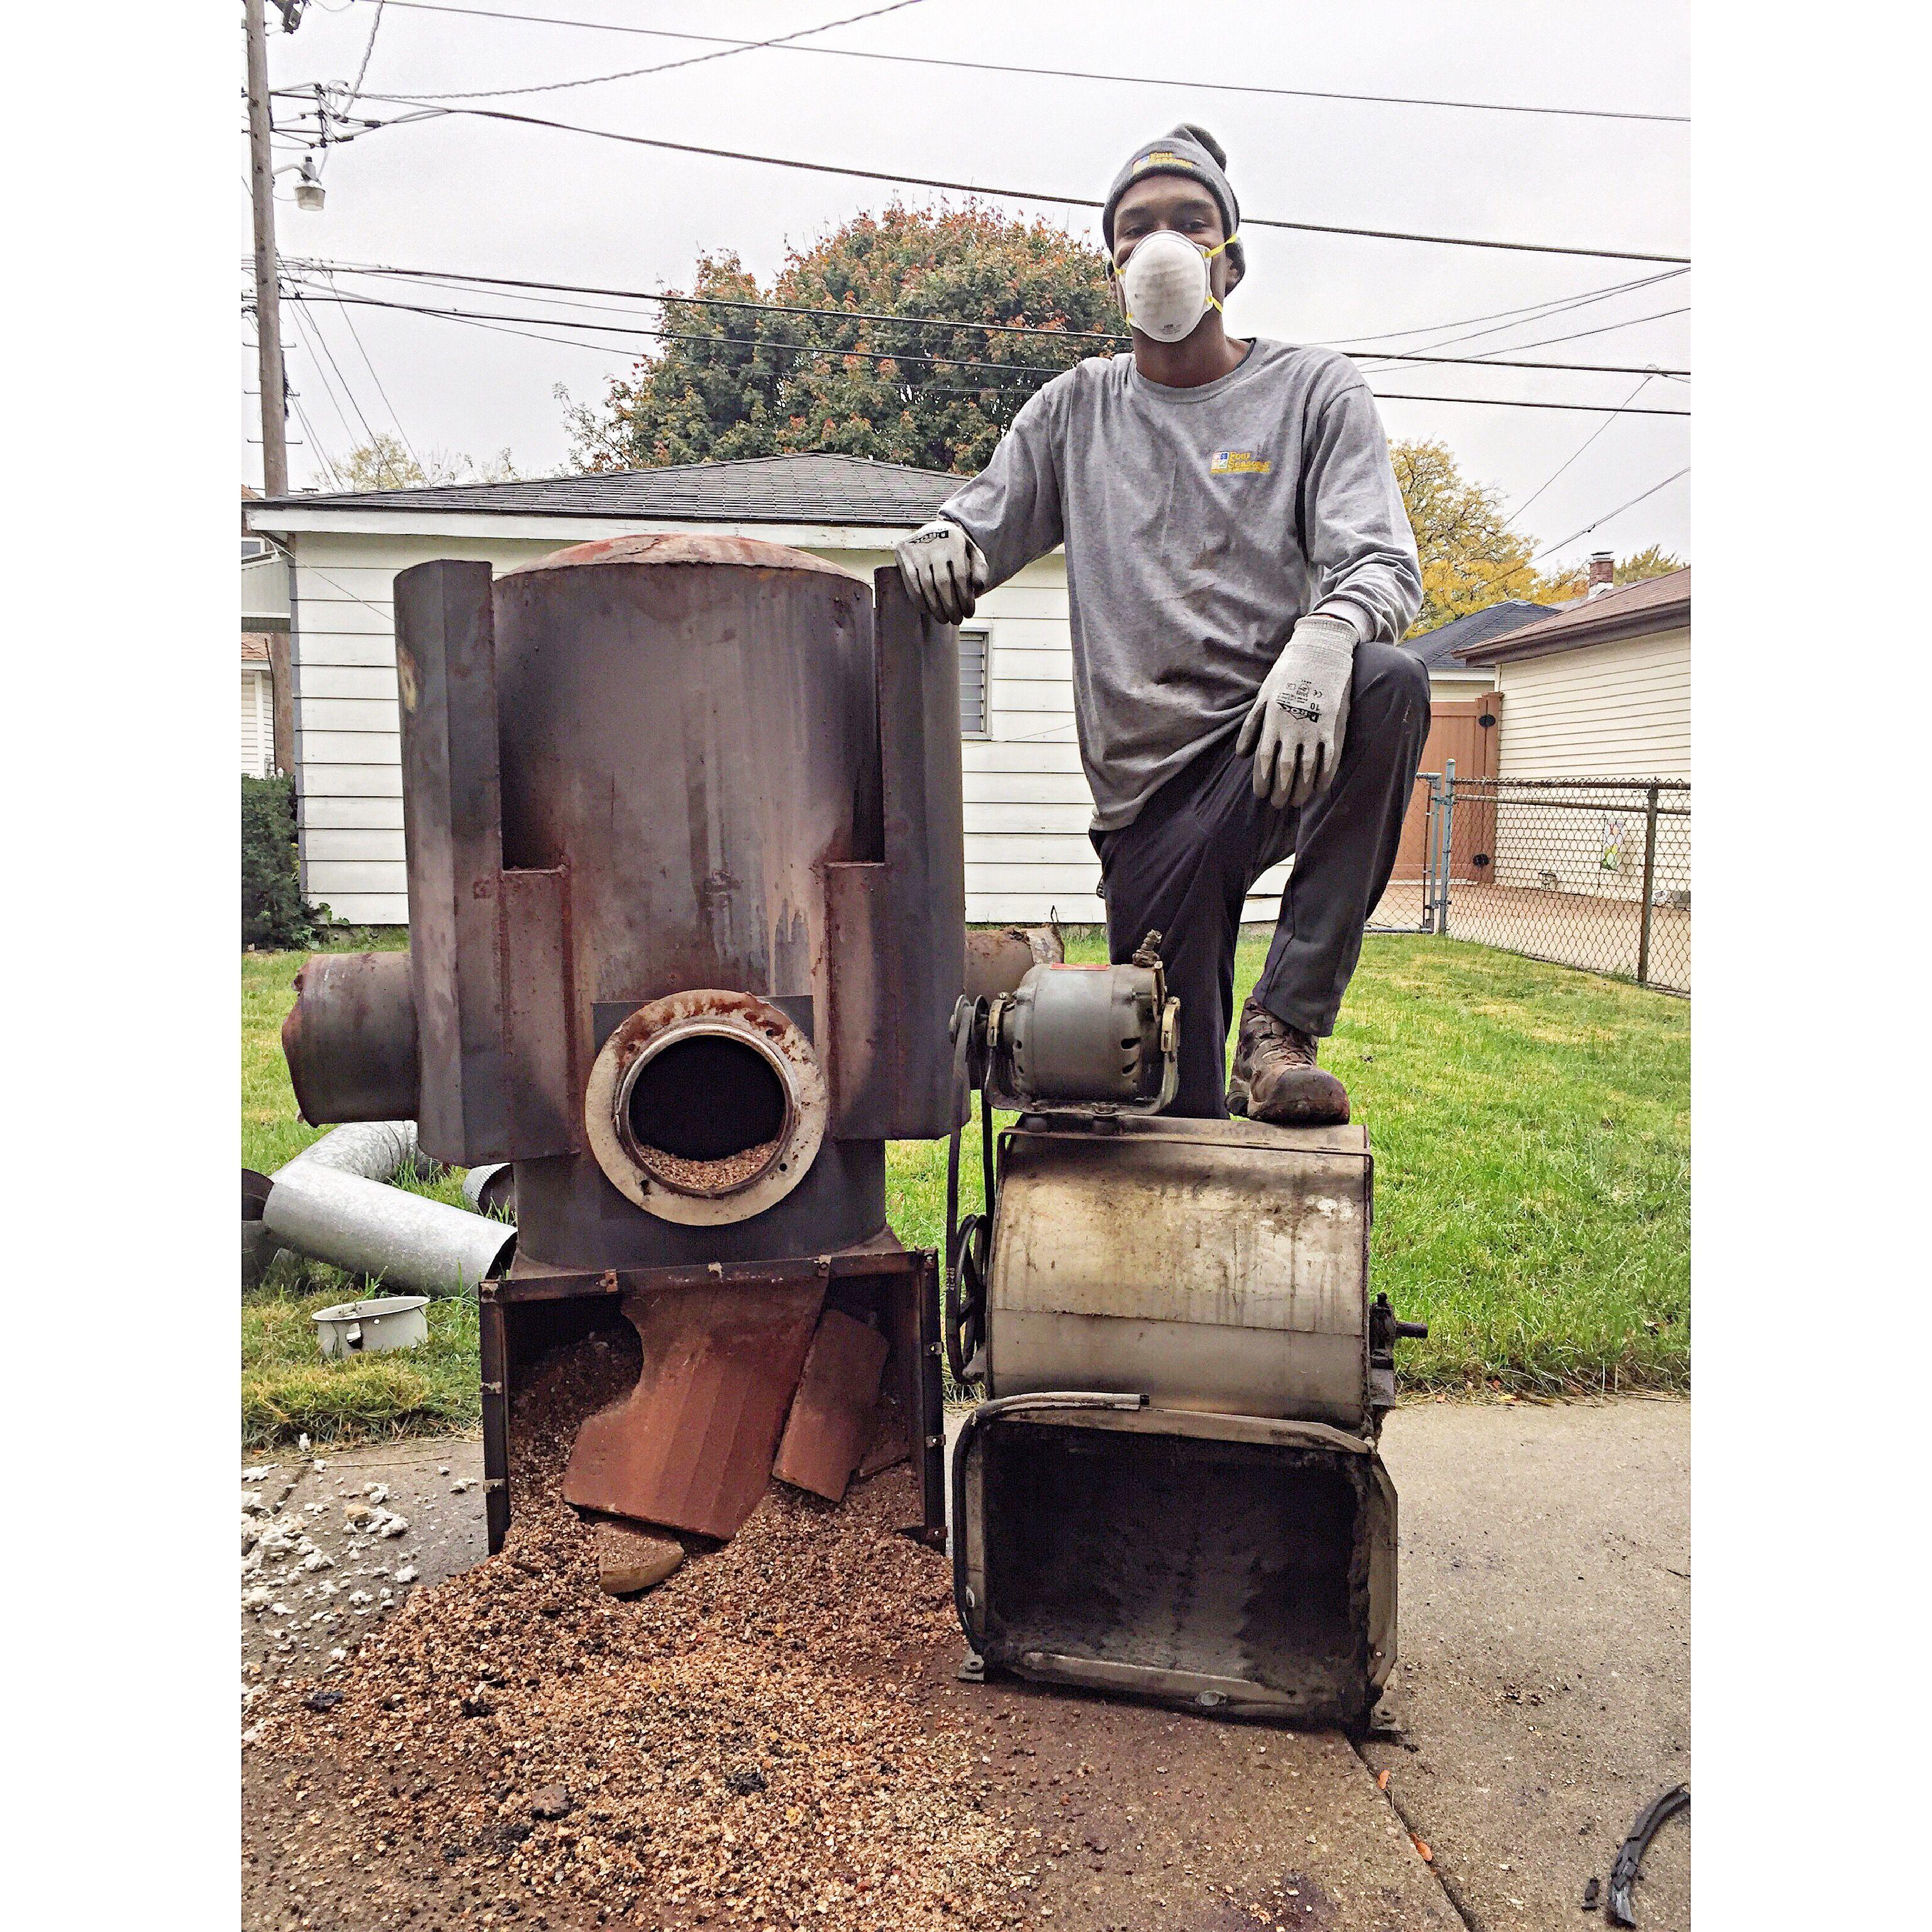 Lowboy Furnace Heat Exchanger and Blower Motor HVAClife